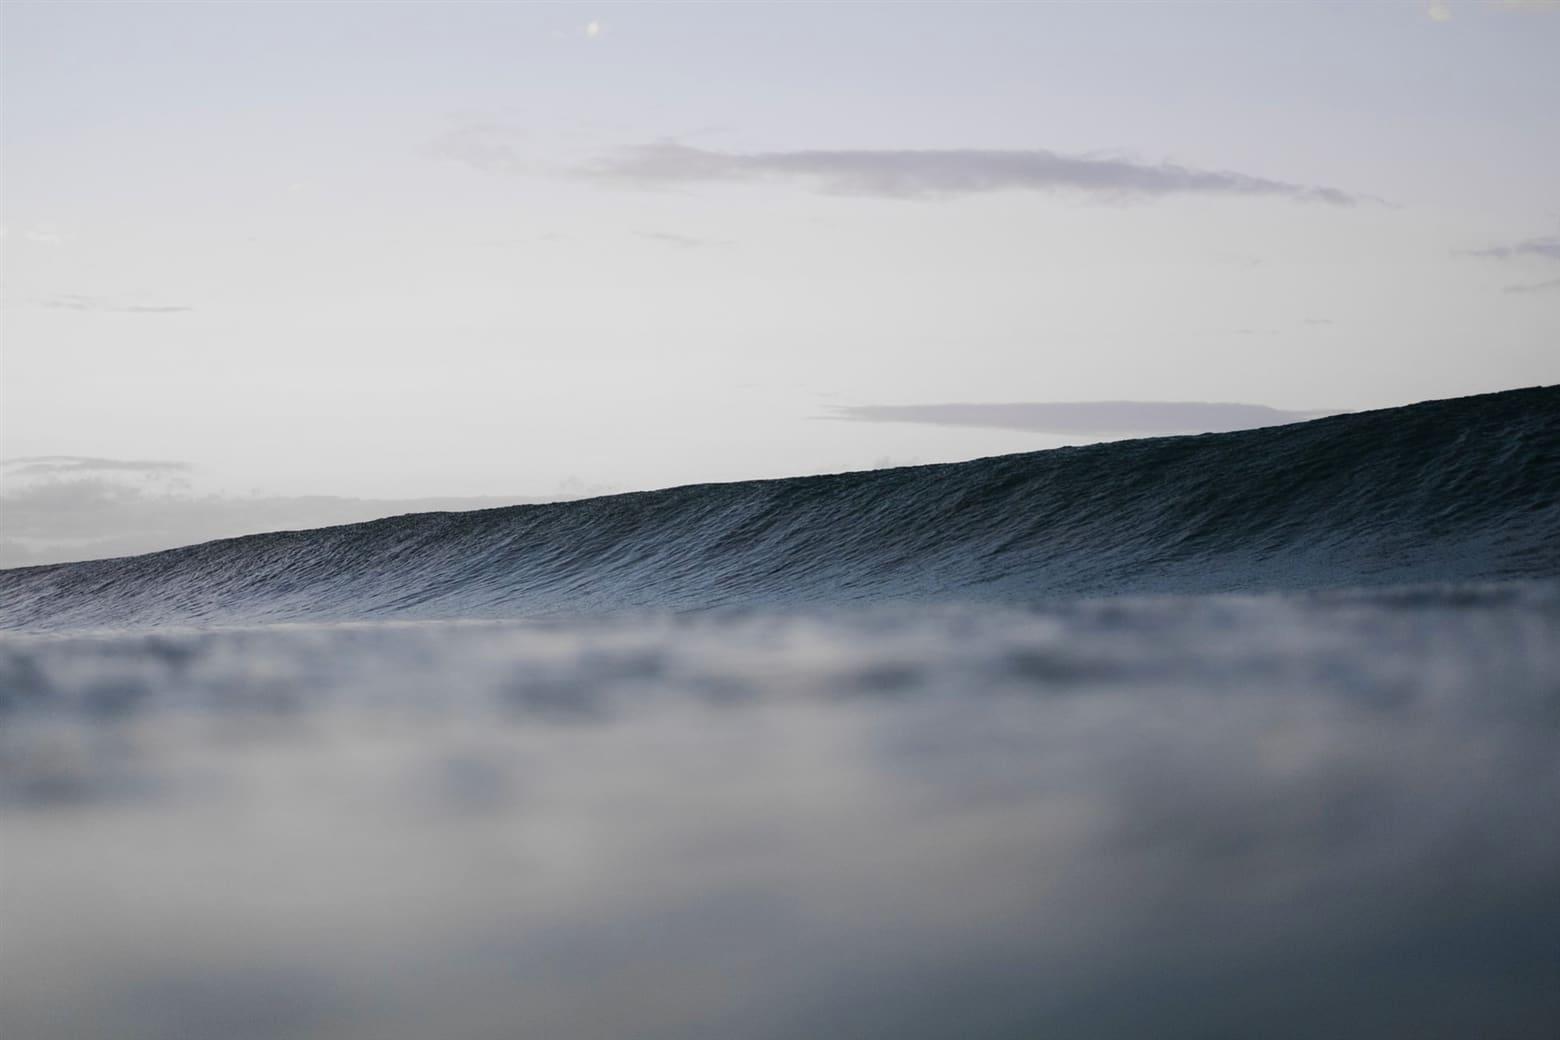 horaires marées Blaye